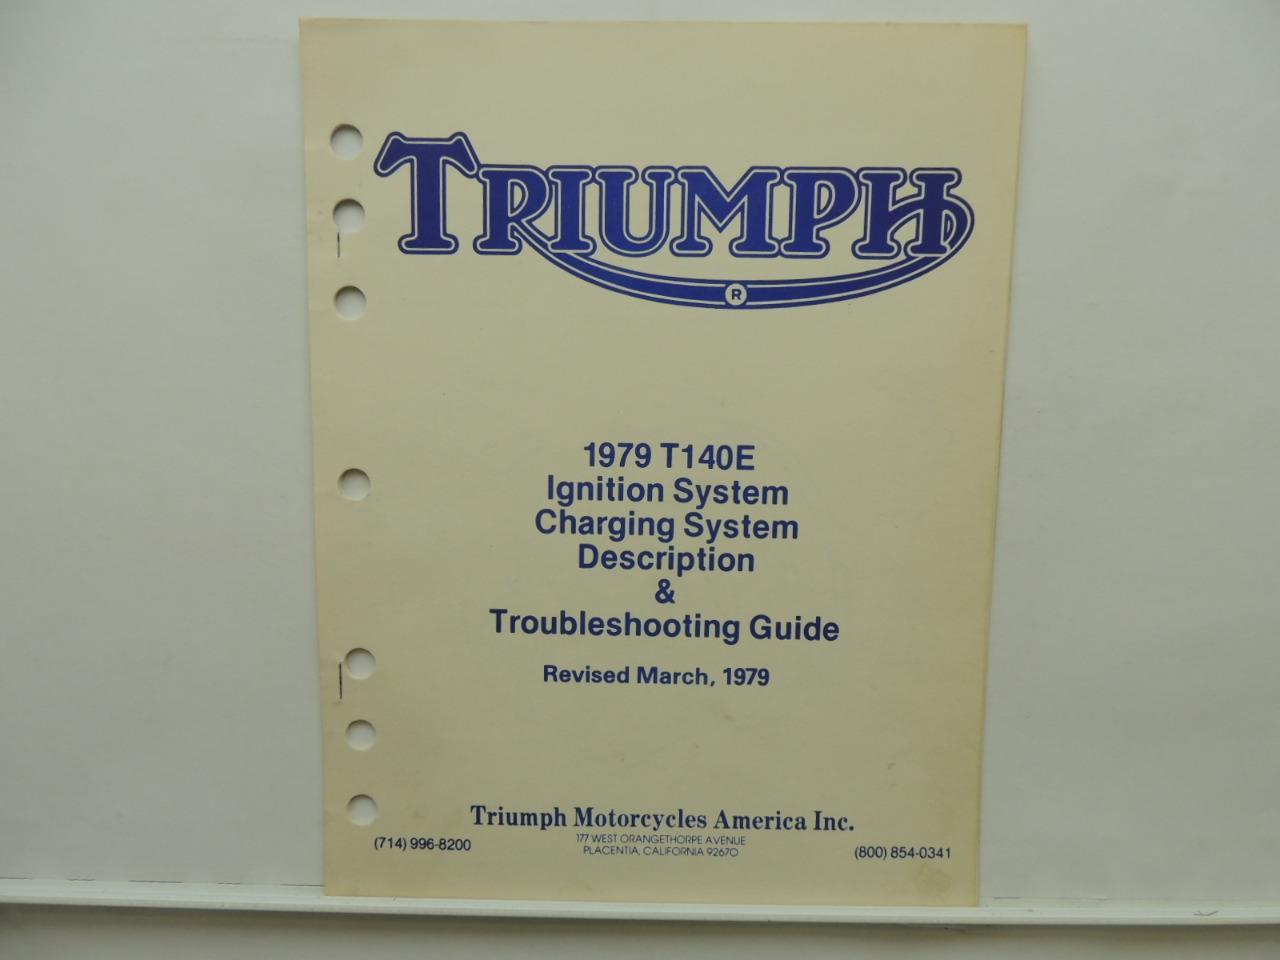 1973 Triumph Bonneville Wiring Diagram Also Triumph Wiring Diagram On